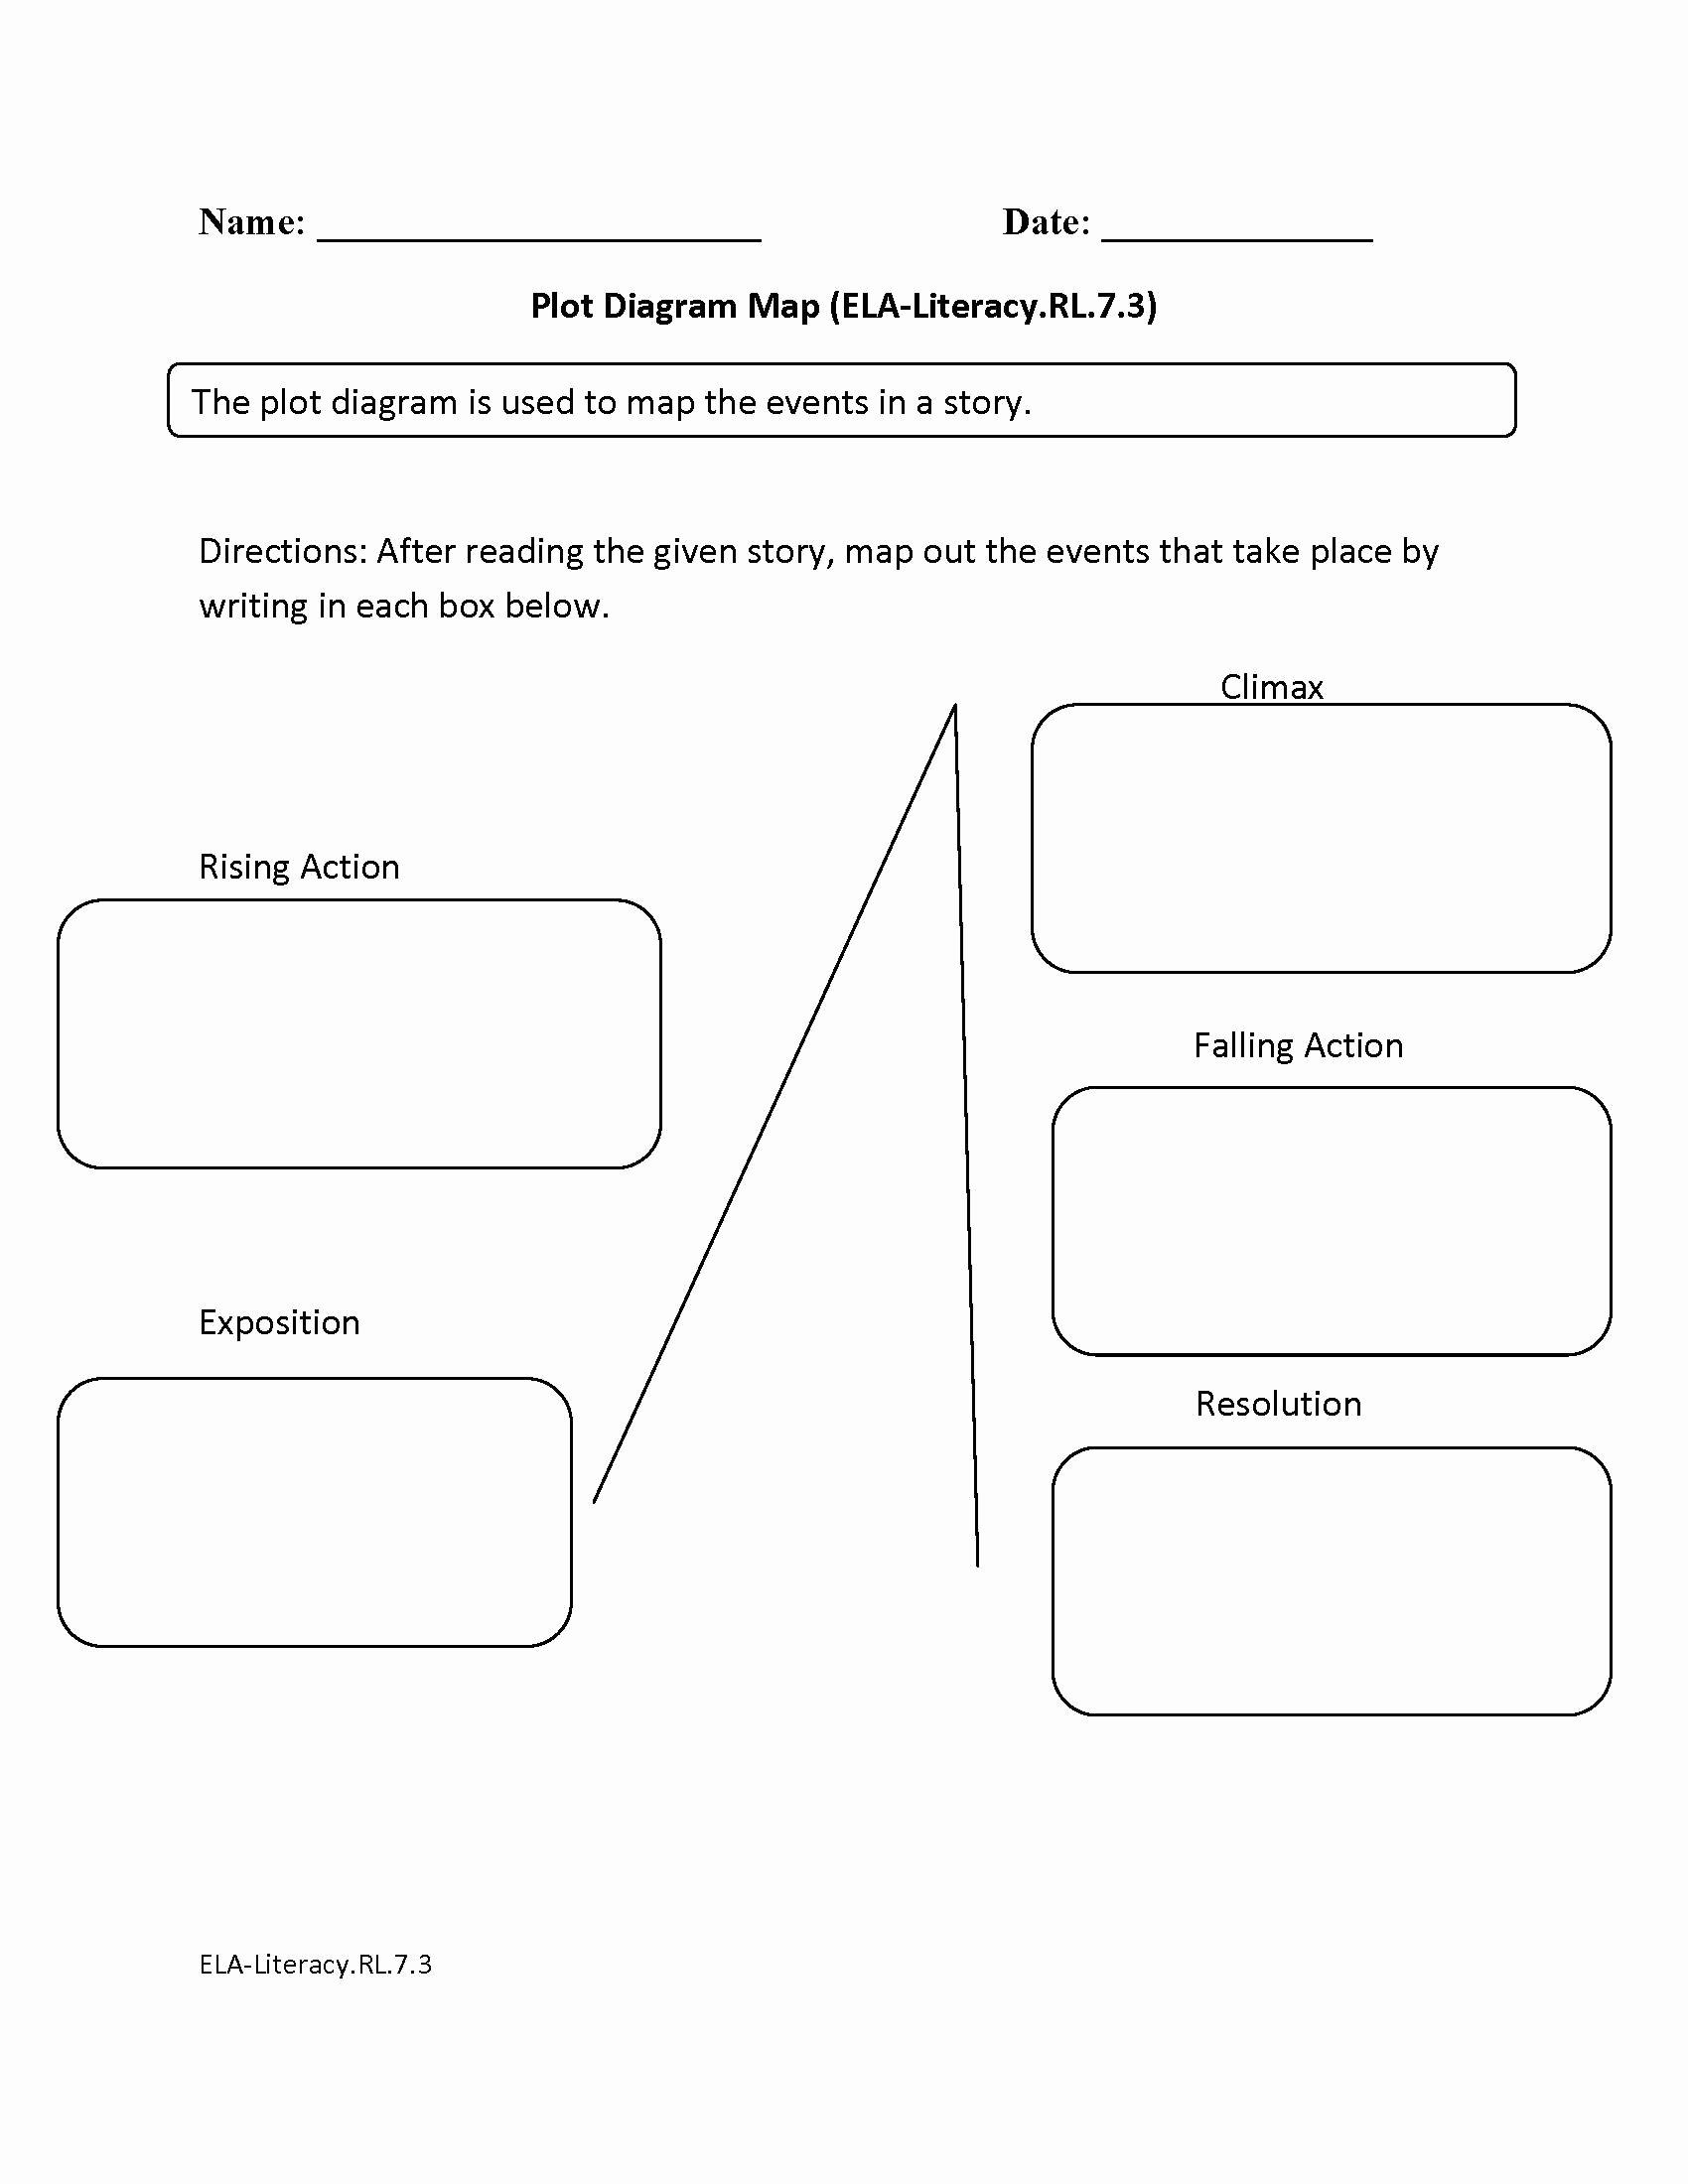 Plot Diagram Worksheet Pdf Inspirational Blank Plot Diagram Worksheet the Best Worksheets Image